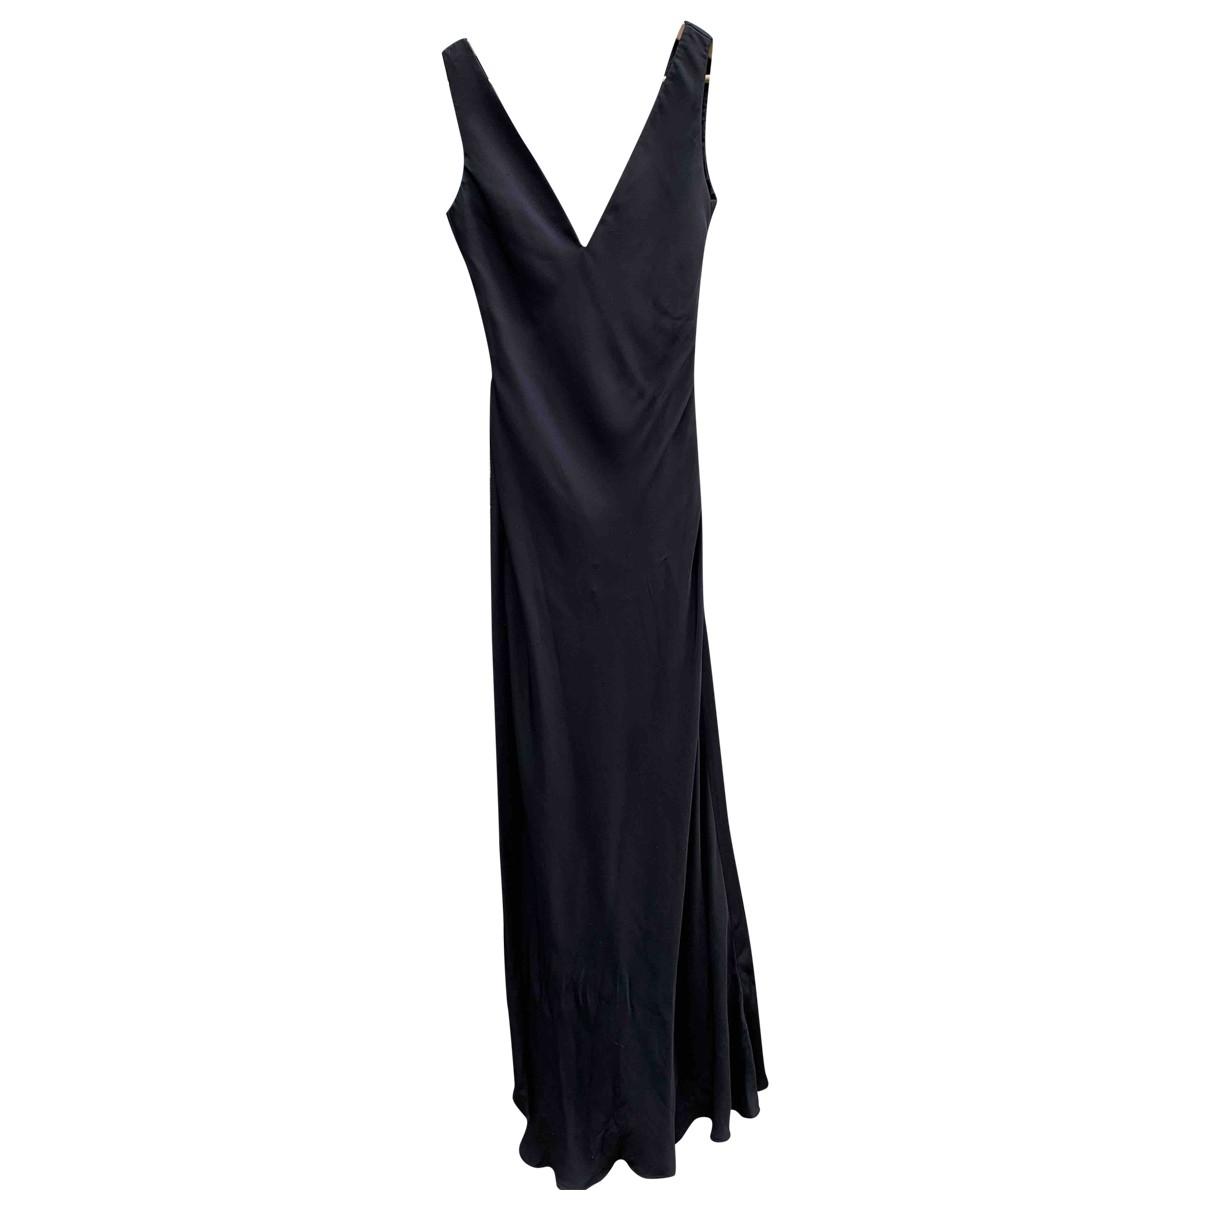 Armani Collezioni \N Black dress for Women 40 IT